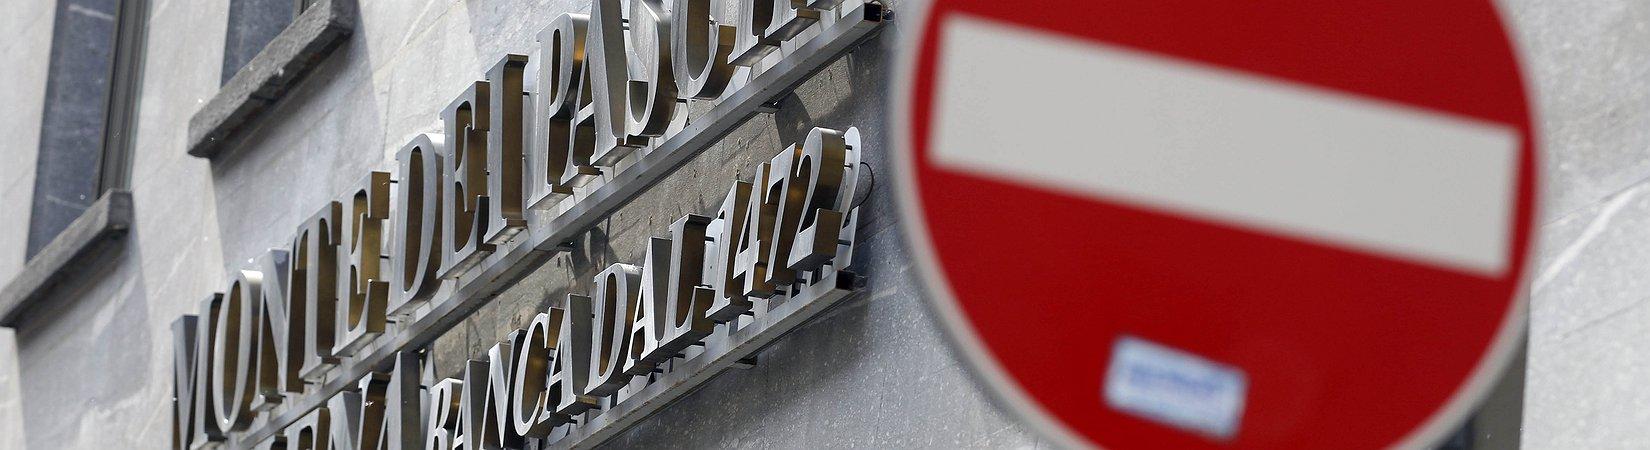 Monte dei Paschi fails to raise €5 billion, Italian government steps up